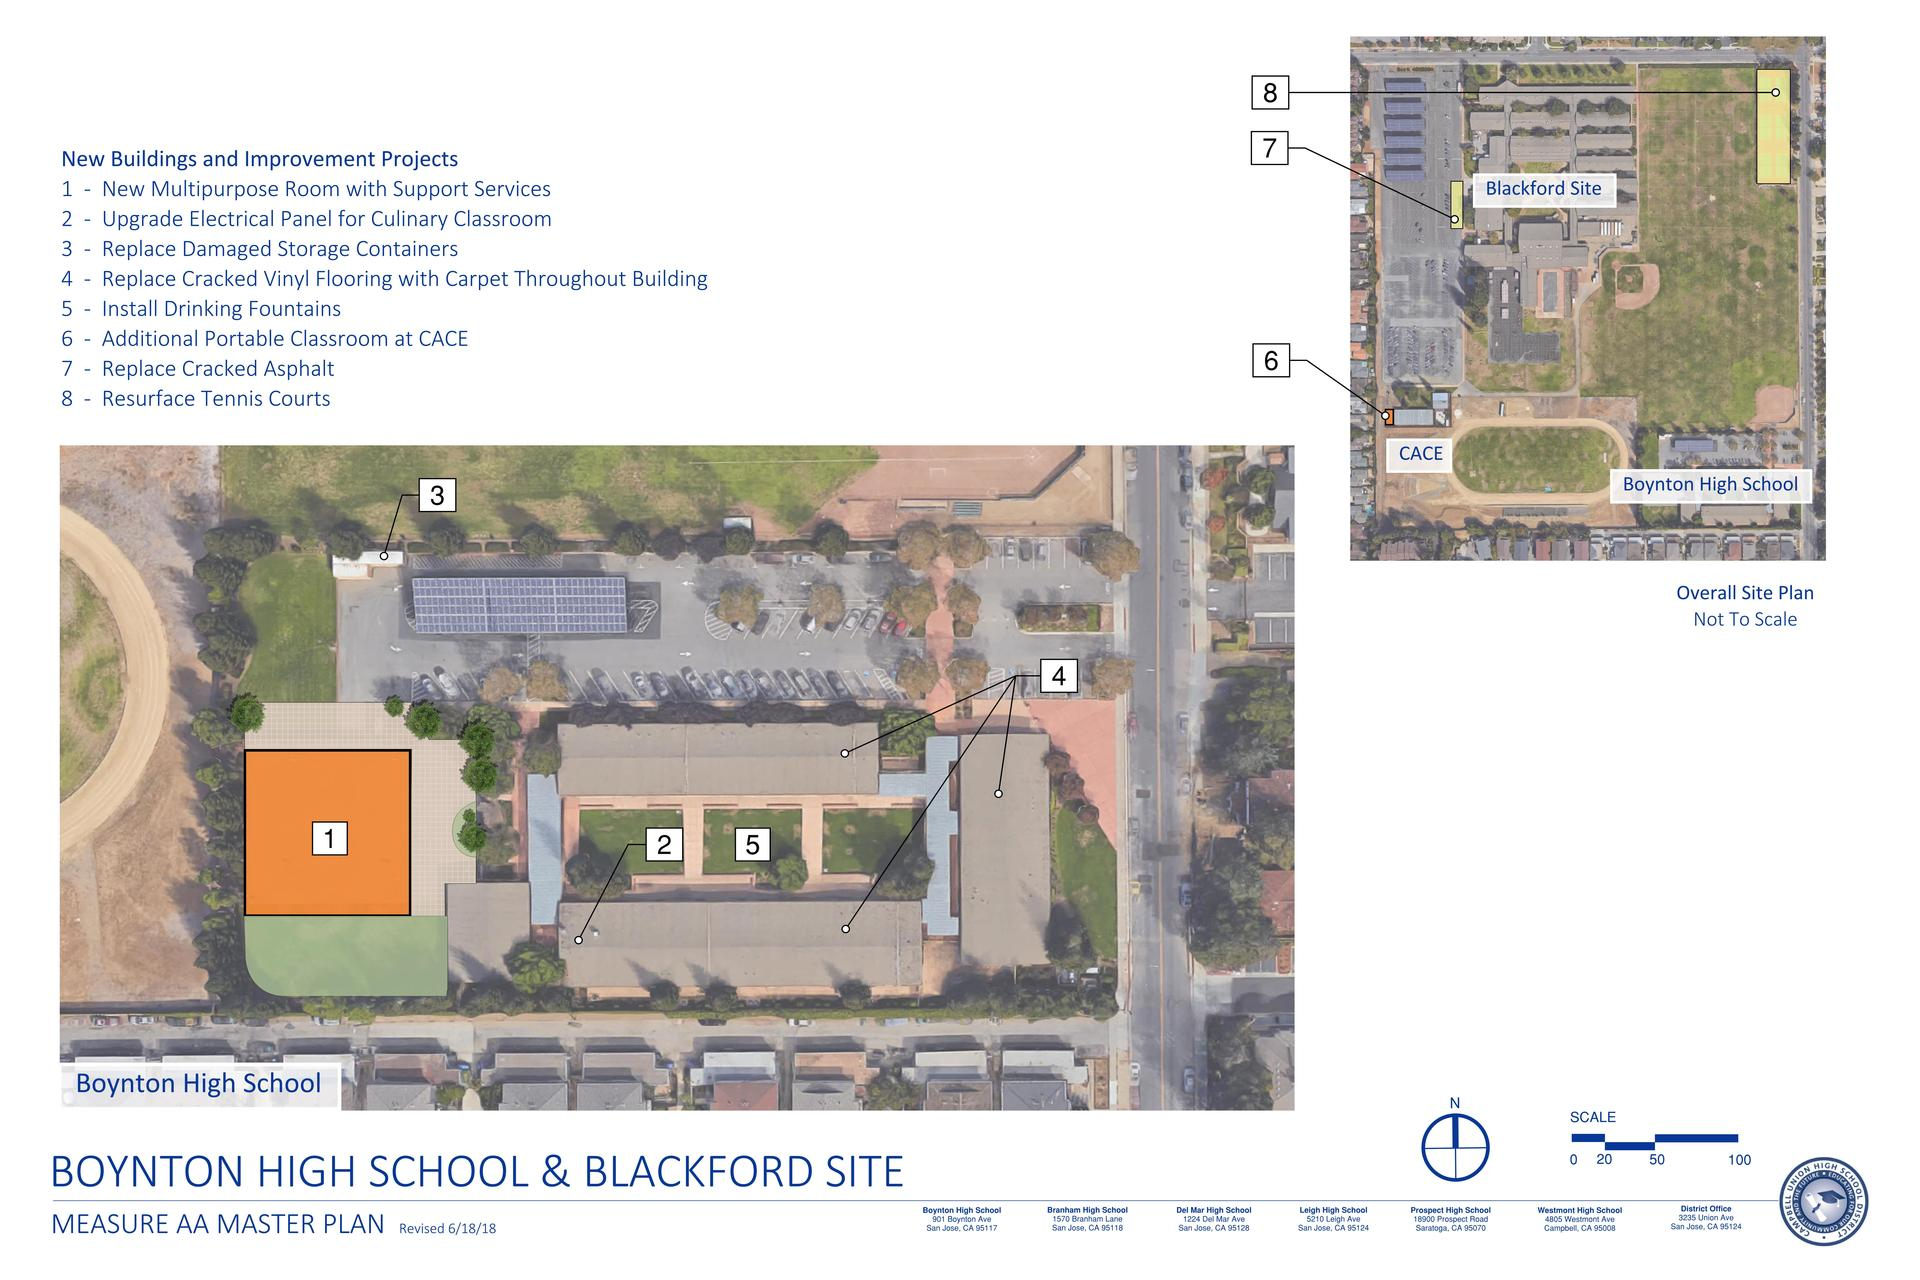 Boynton High School and Blackford Site Master Plans